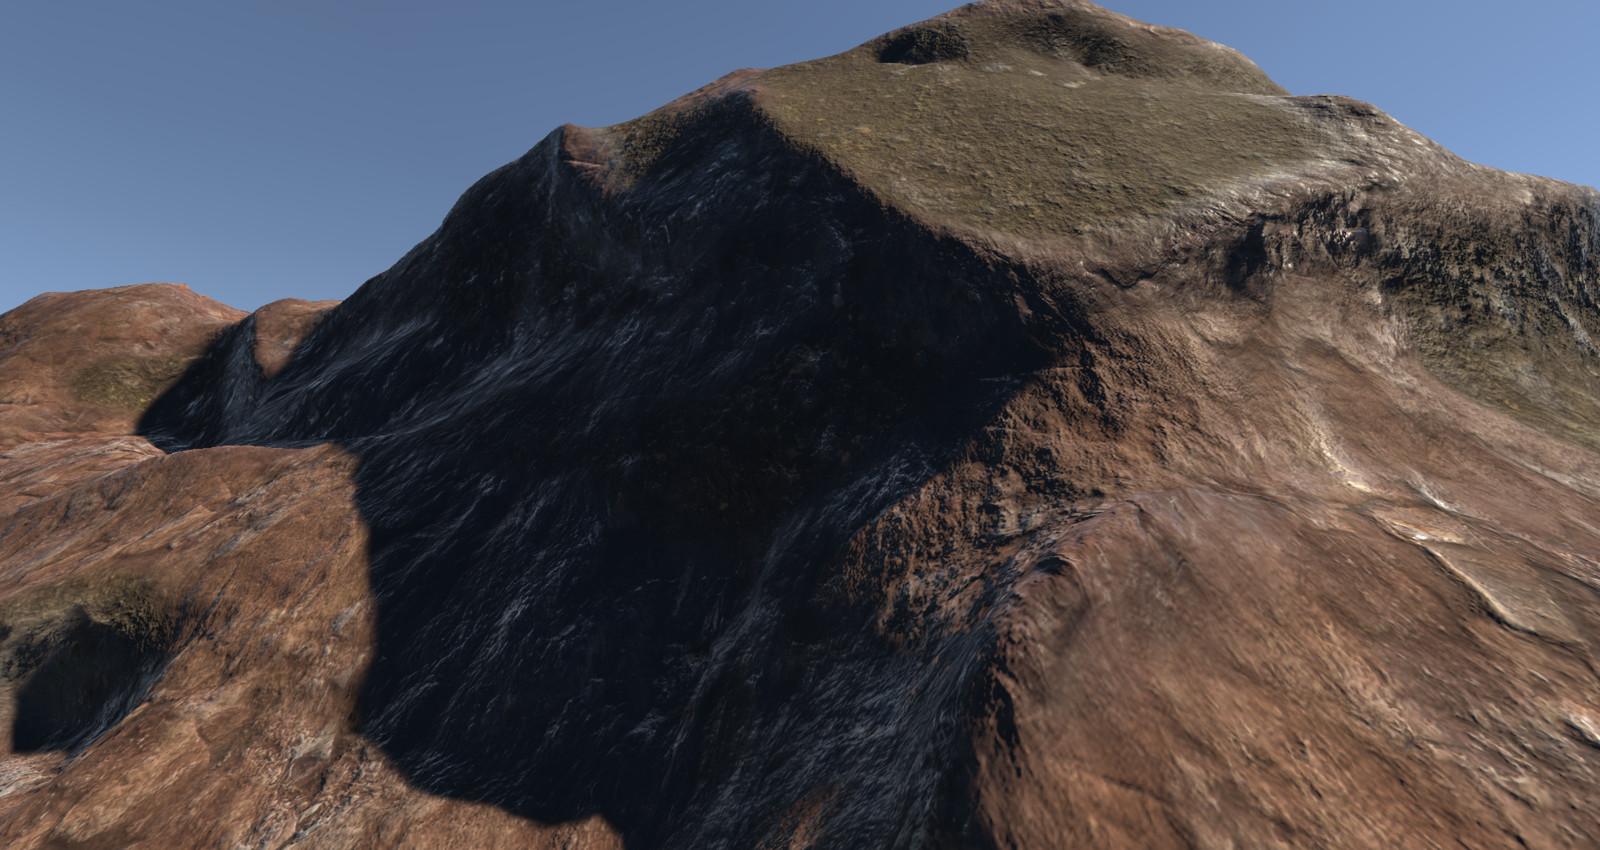 Tri-Planar Terrain Splat Shader